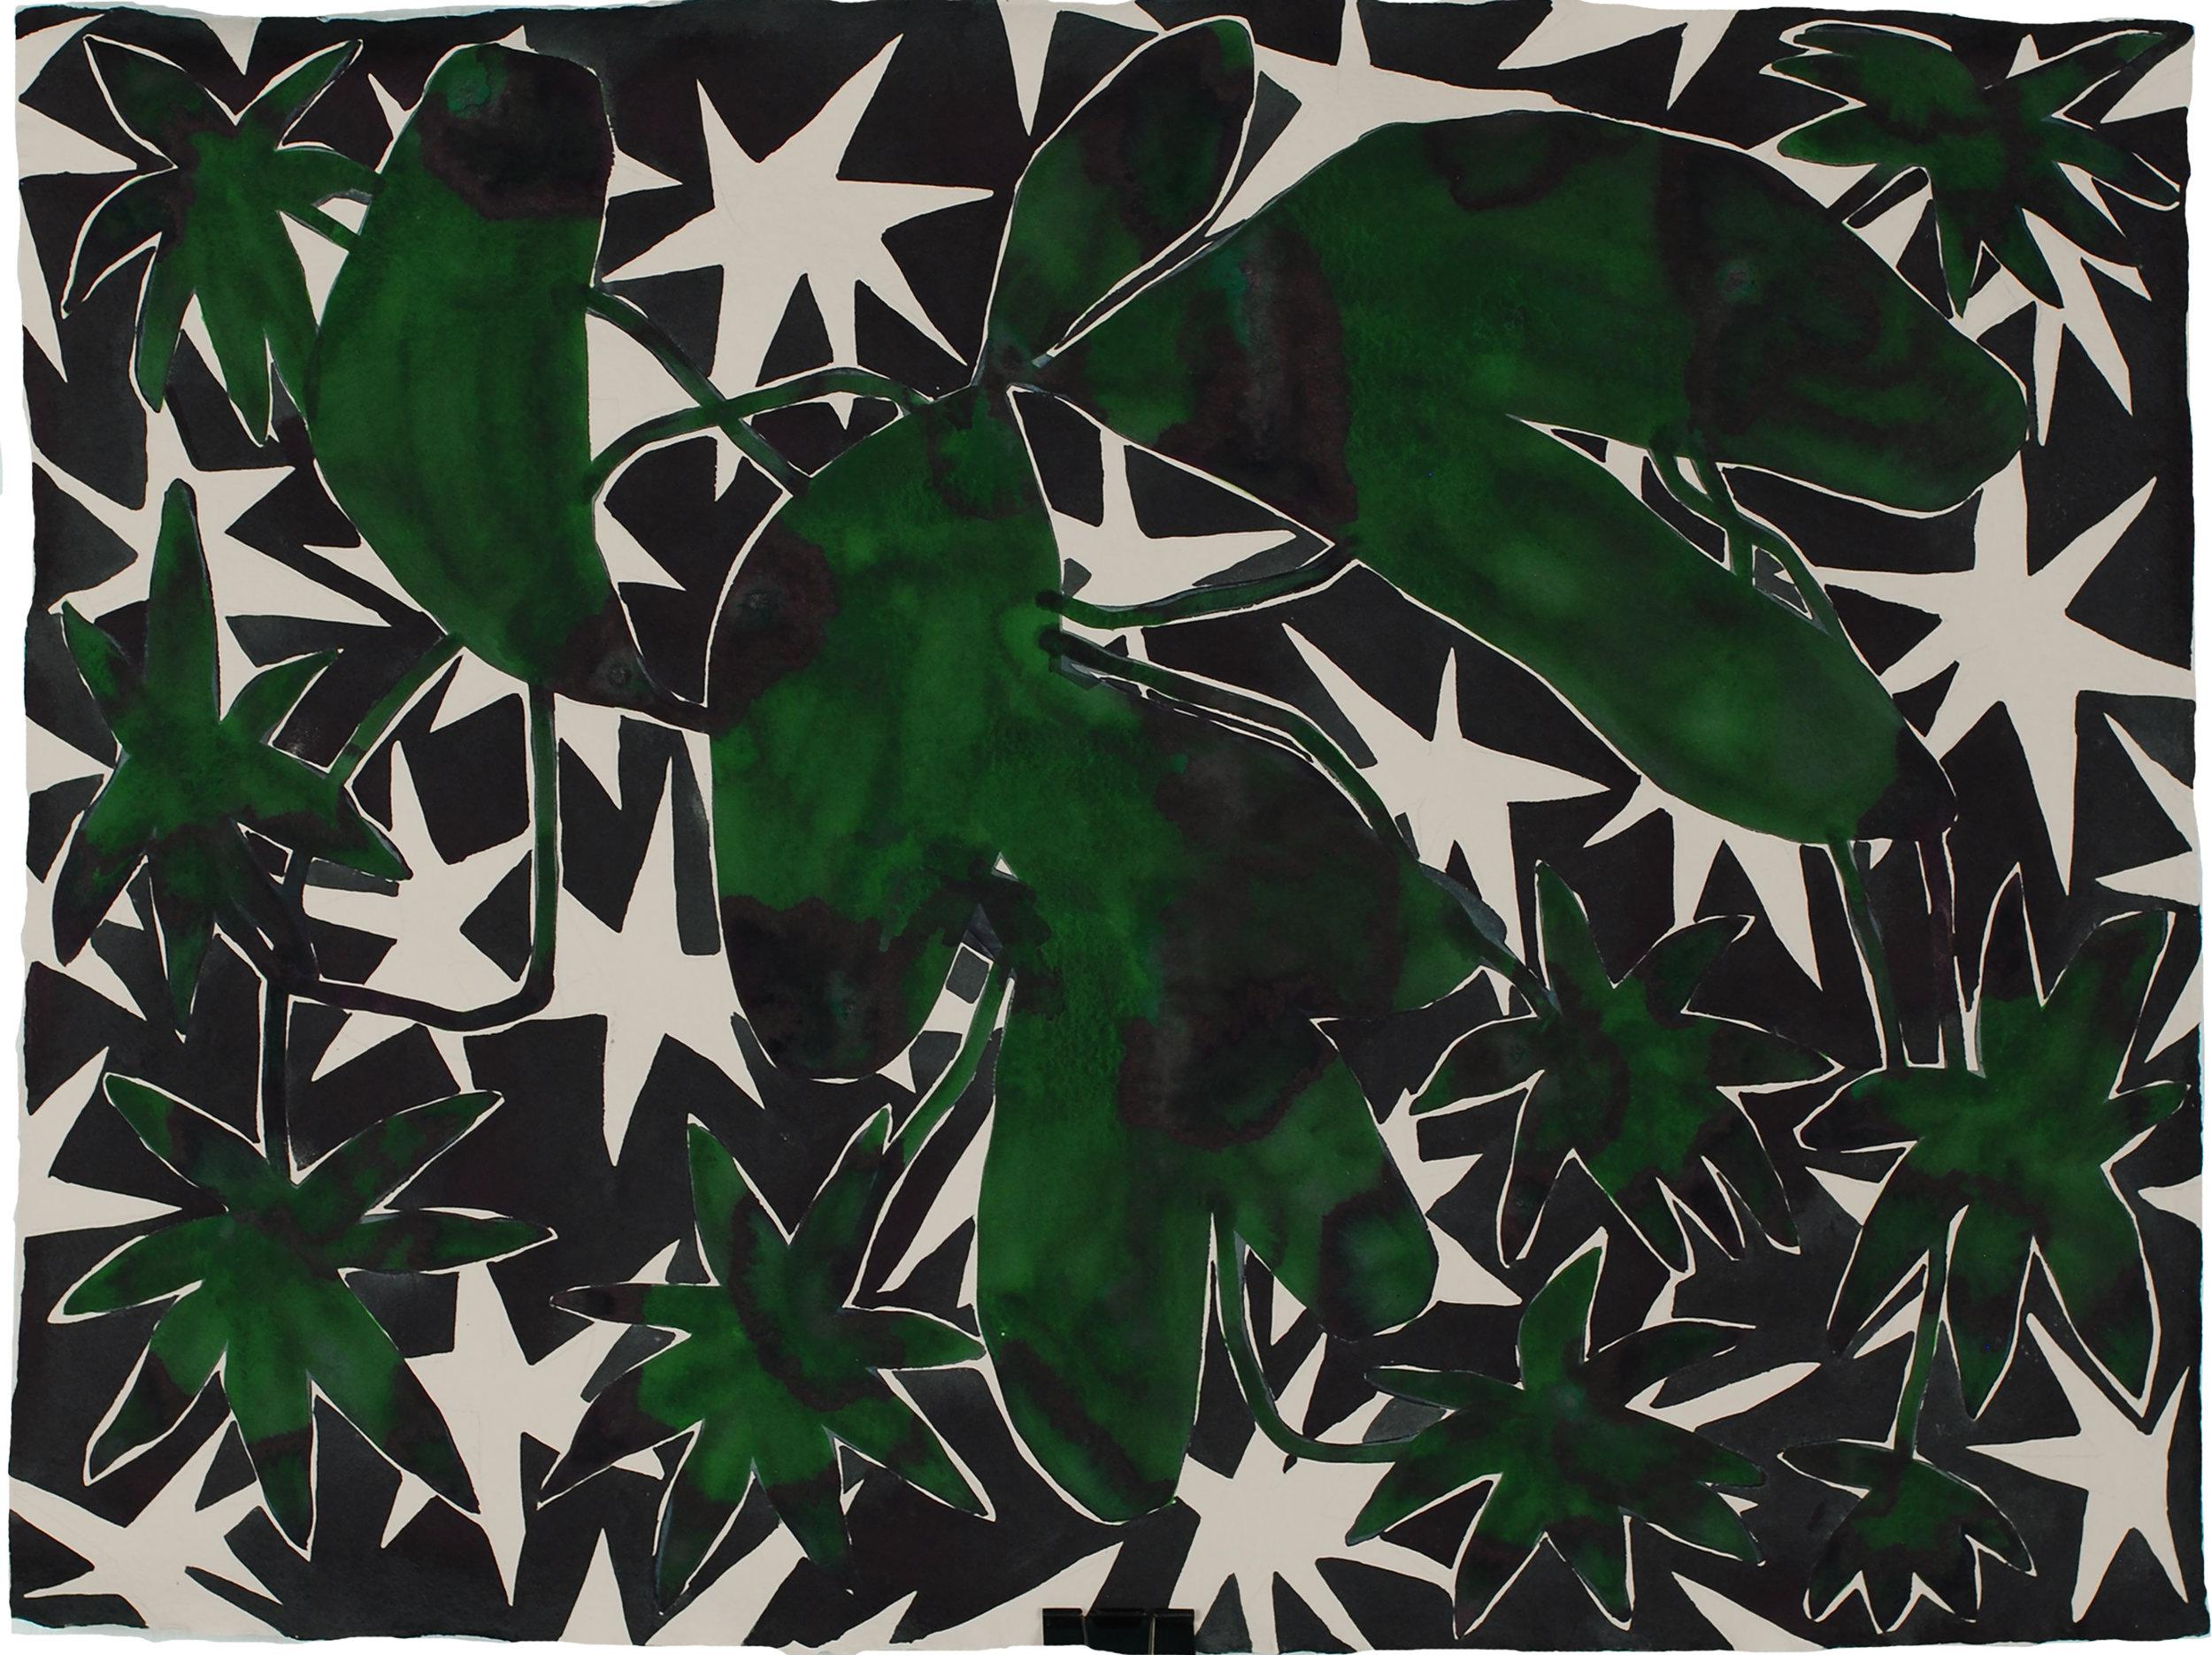 Starry Plant_21.5x28.75.jpg